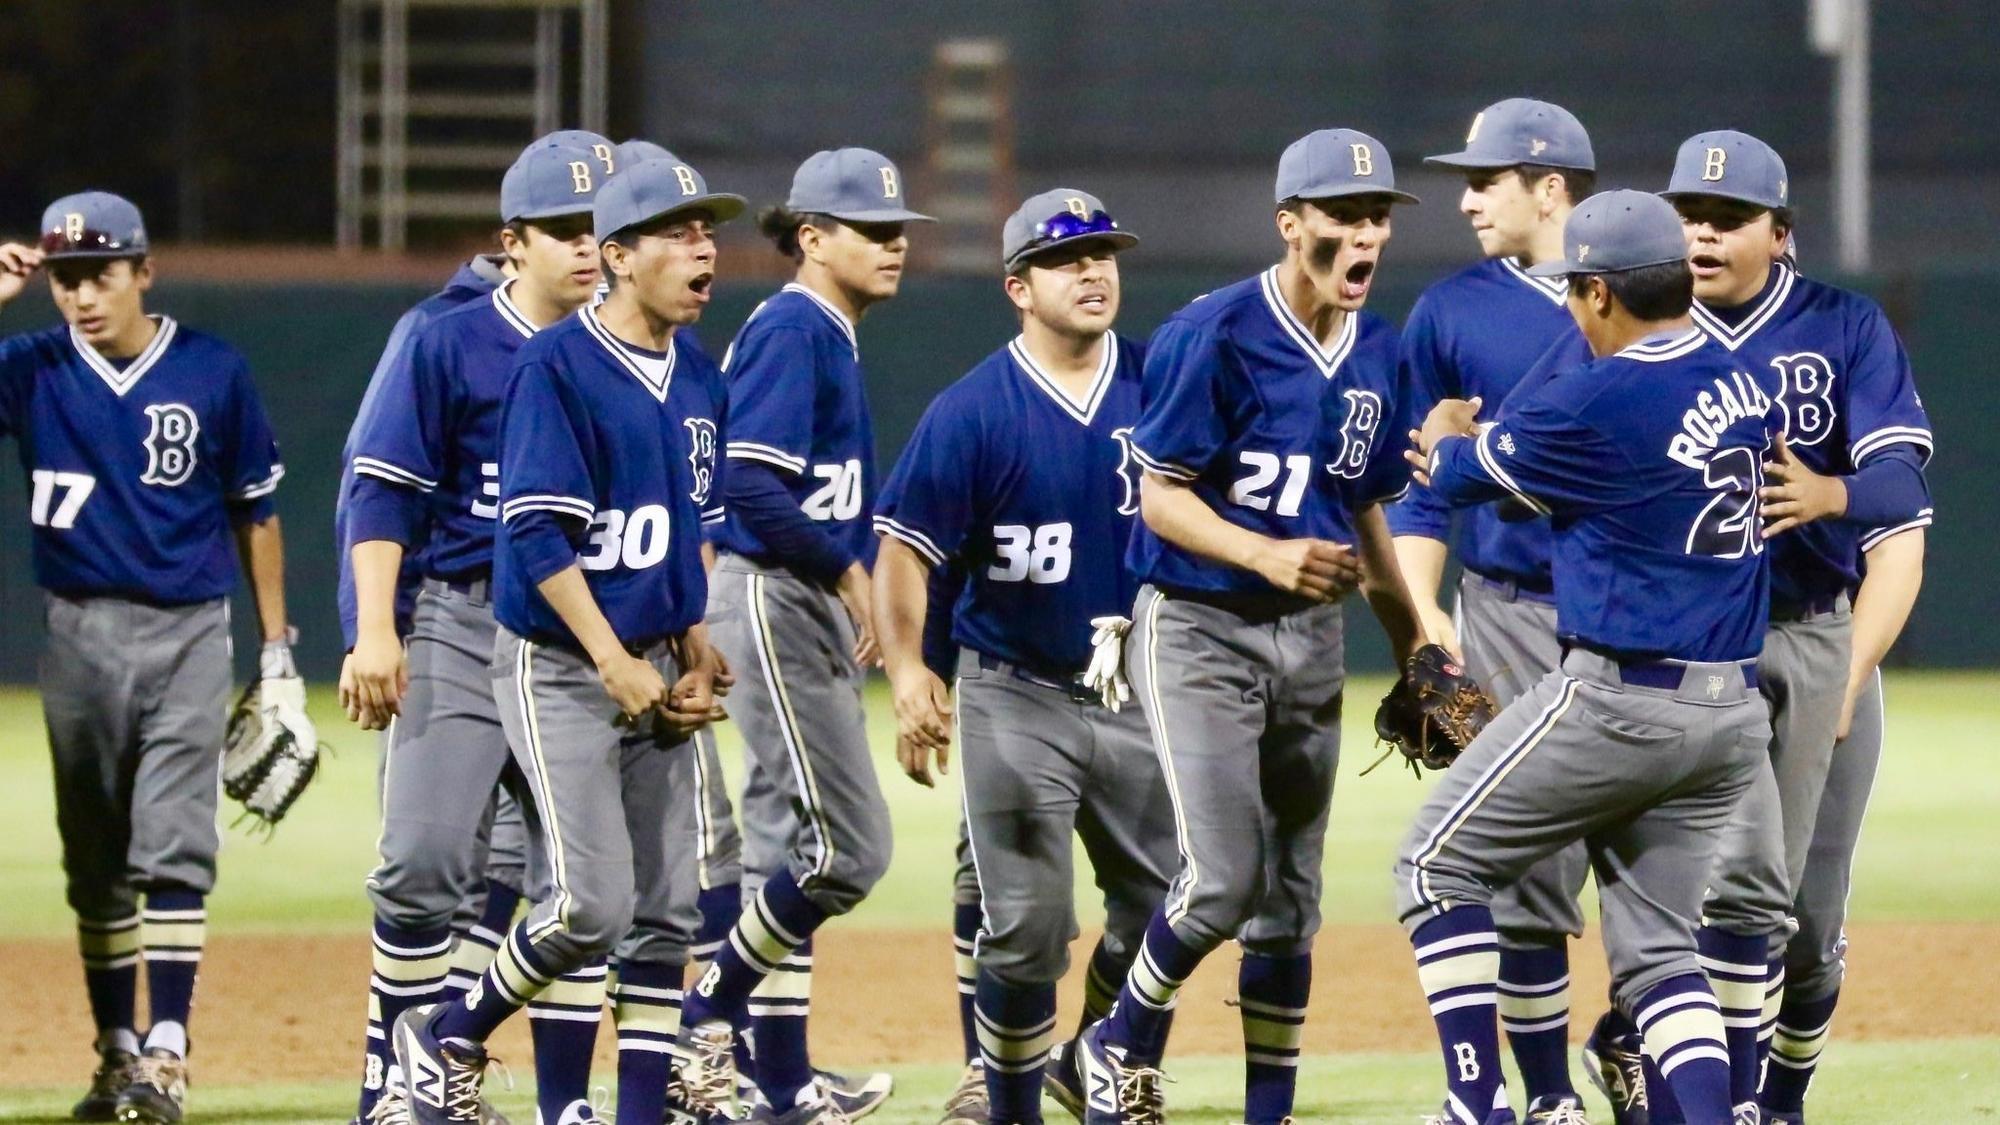 Birmingham, Palisades advance to Dodger Stadium with 1-0 victories